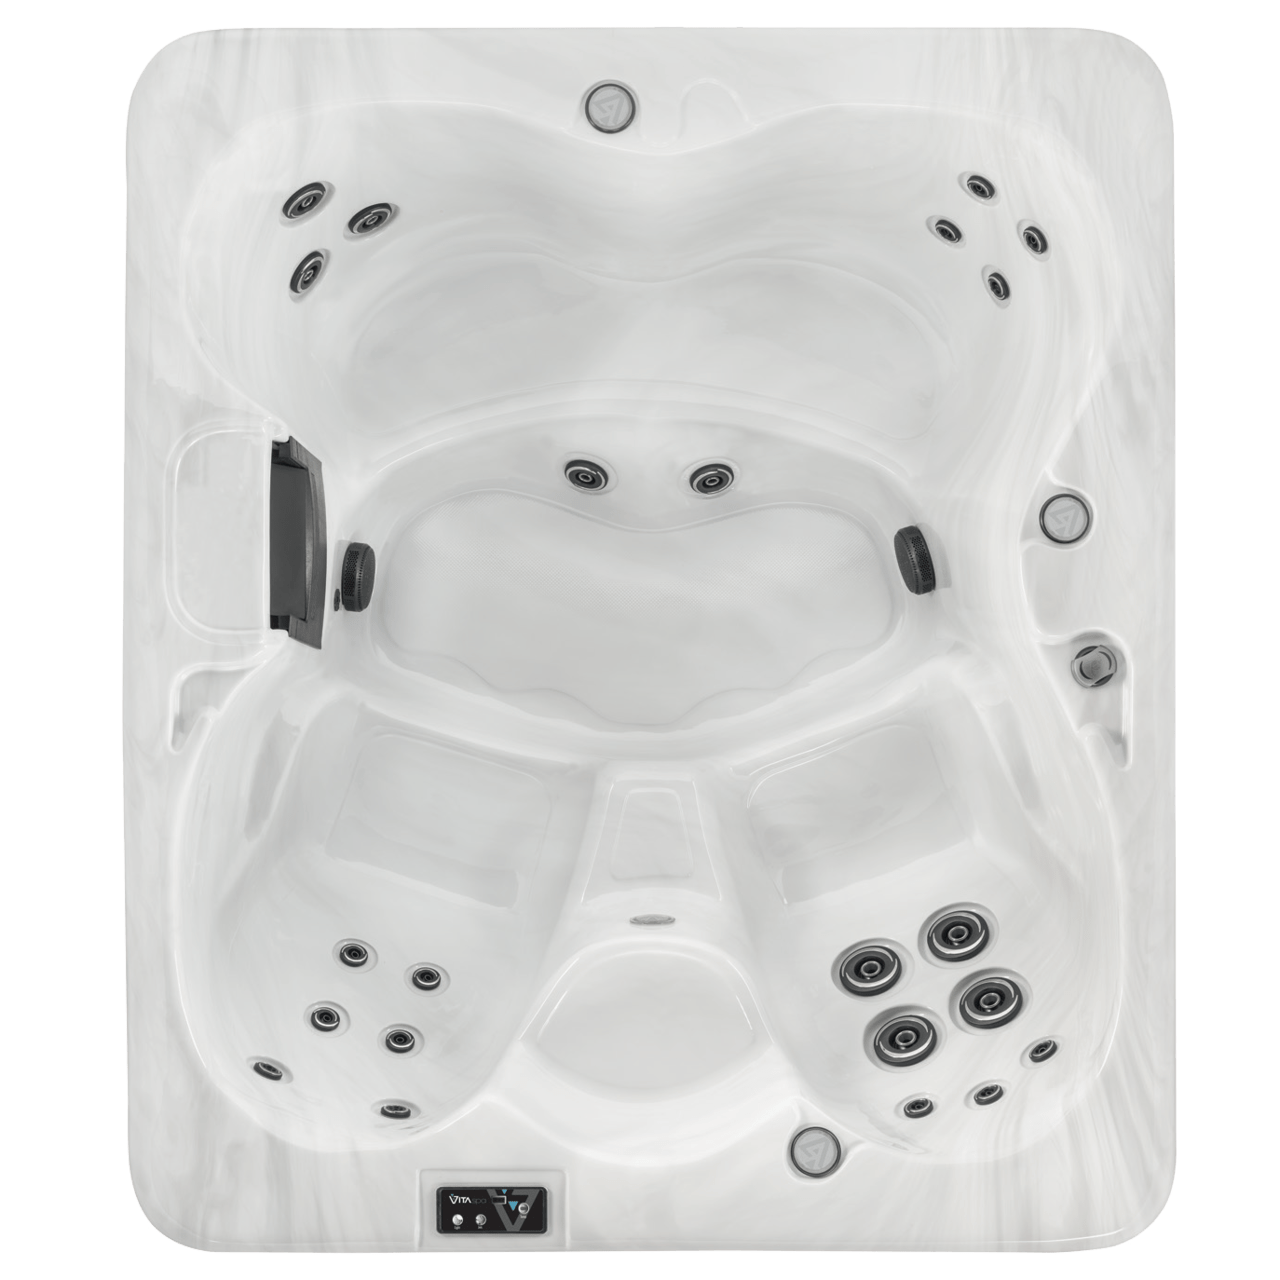 Vita Spas Image Hot Tub